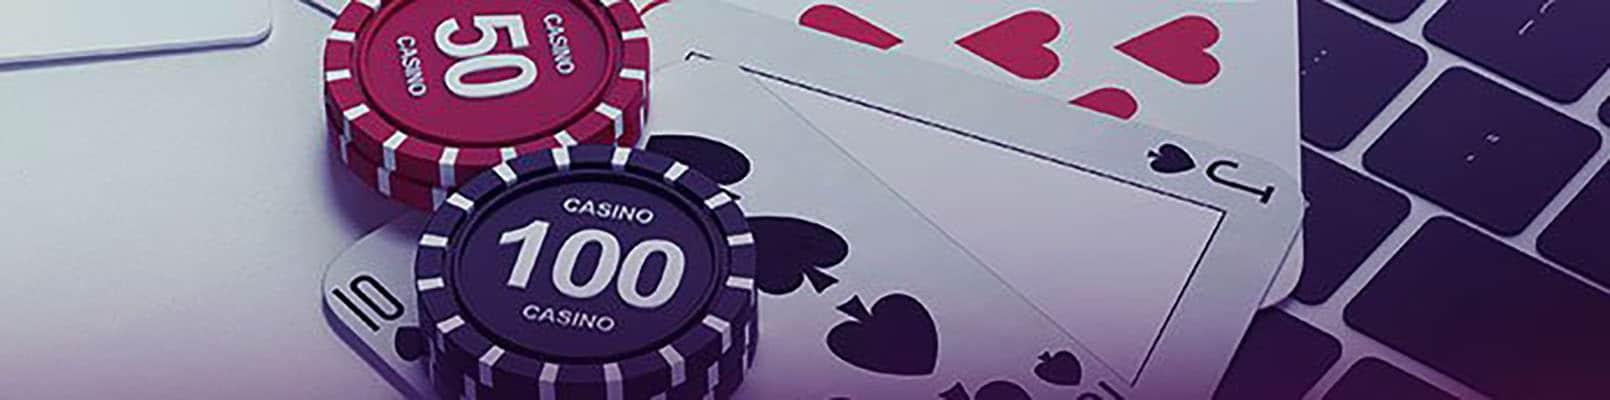 oferte bonus cu depunere cazino